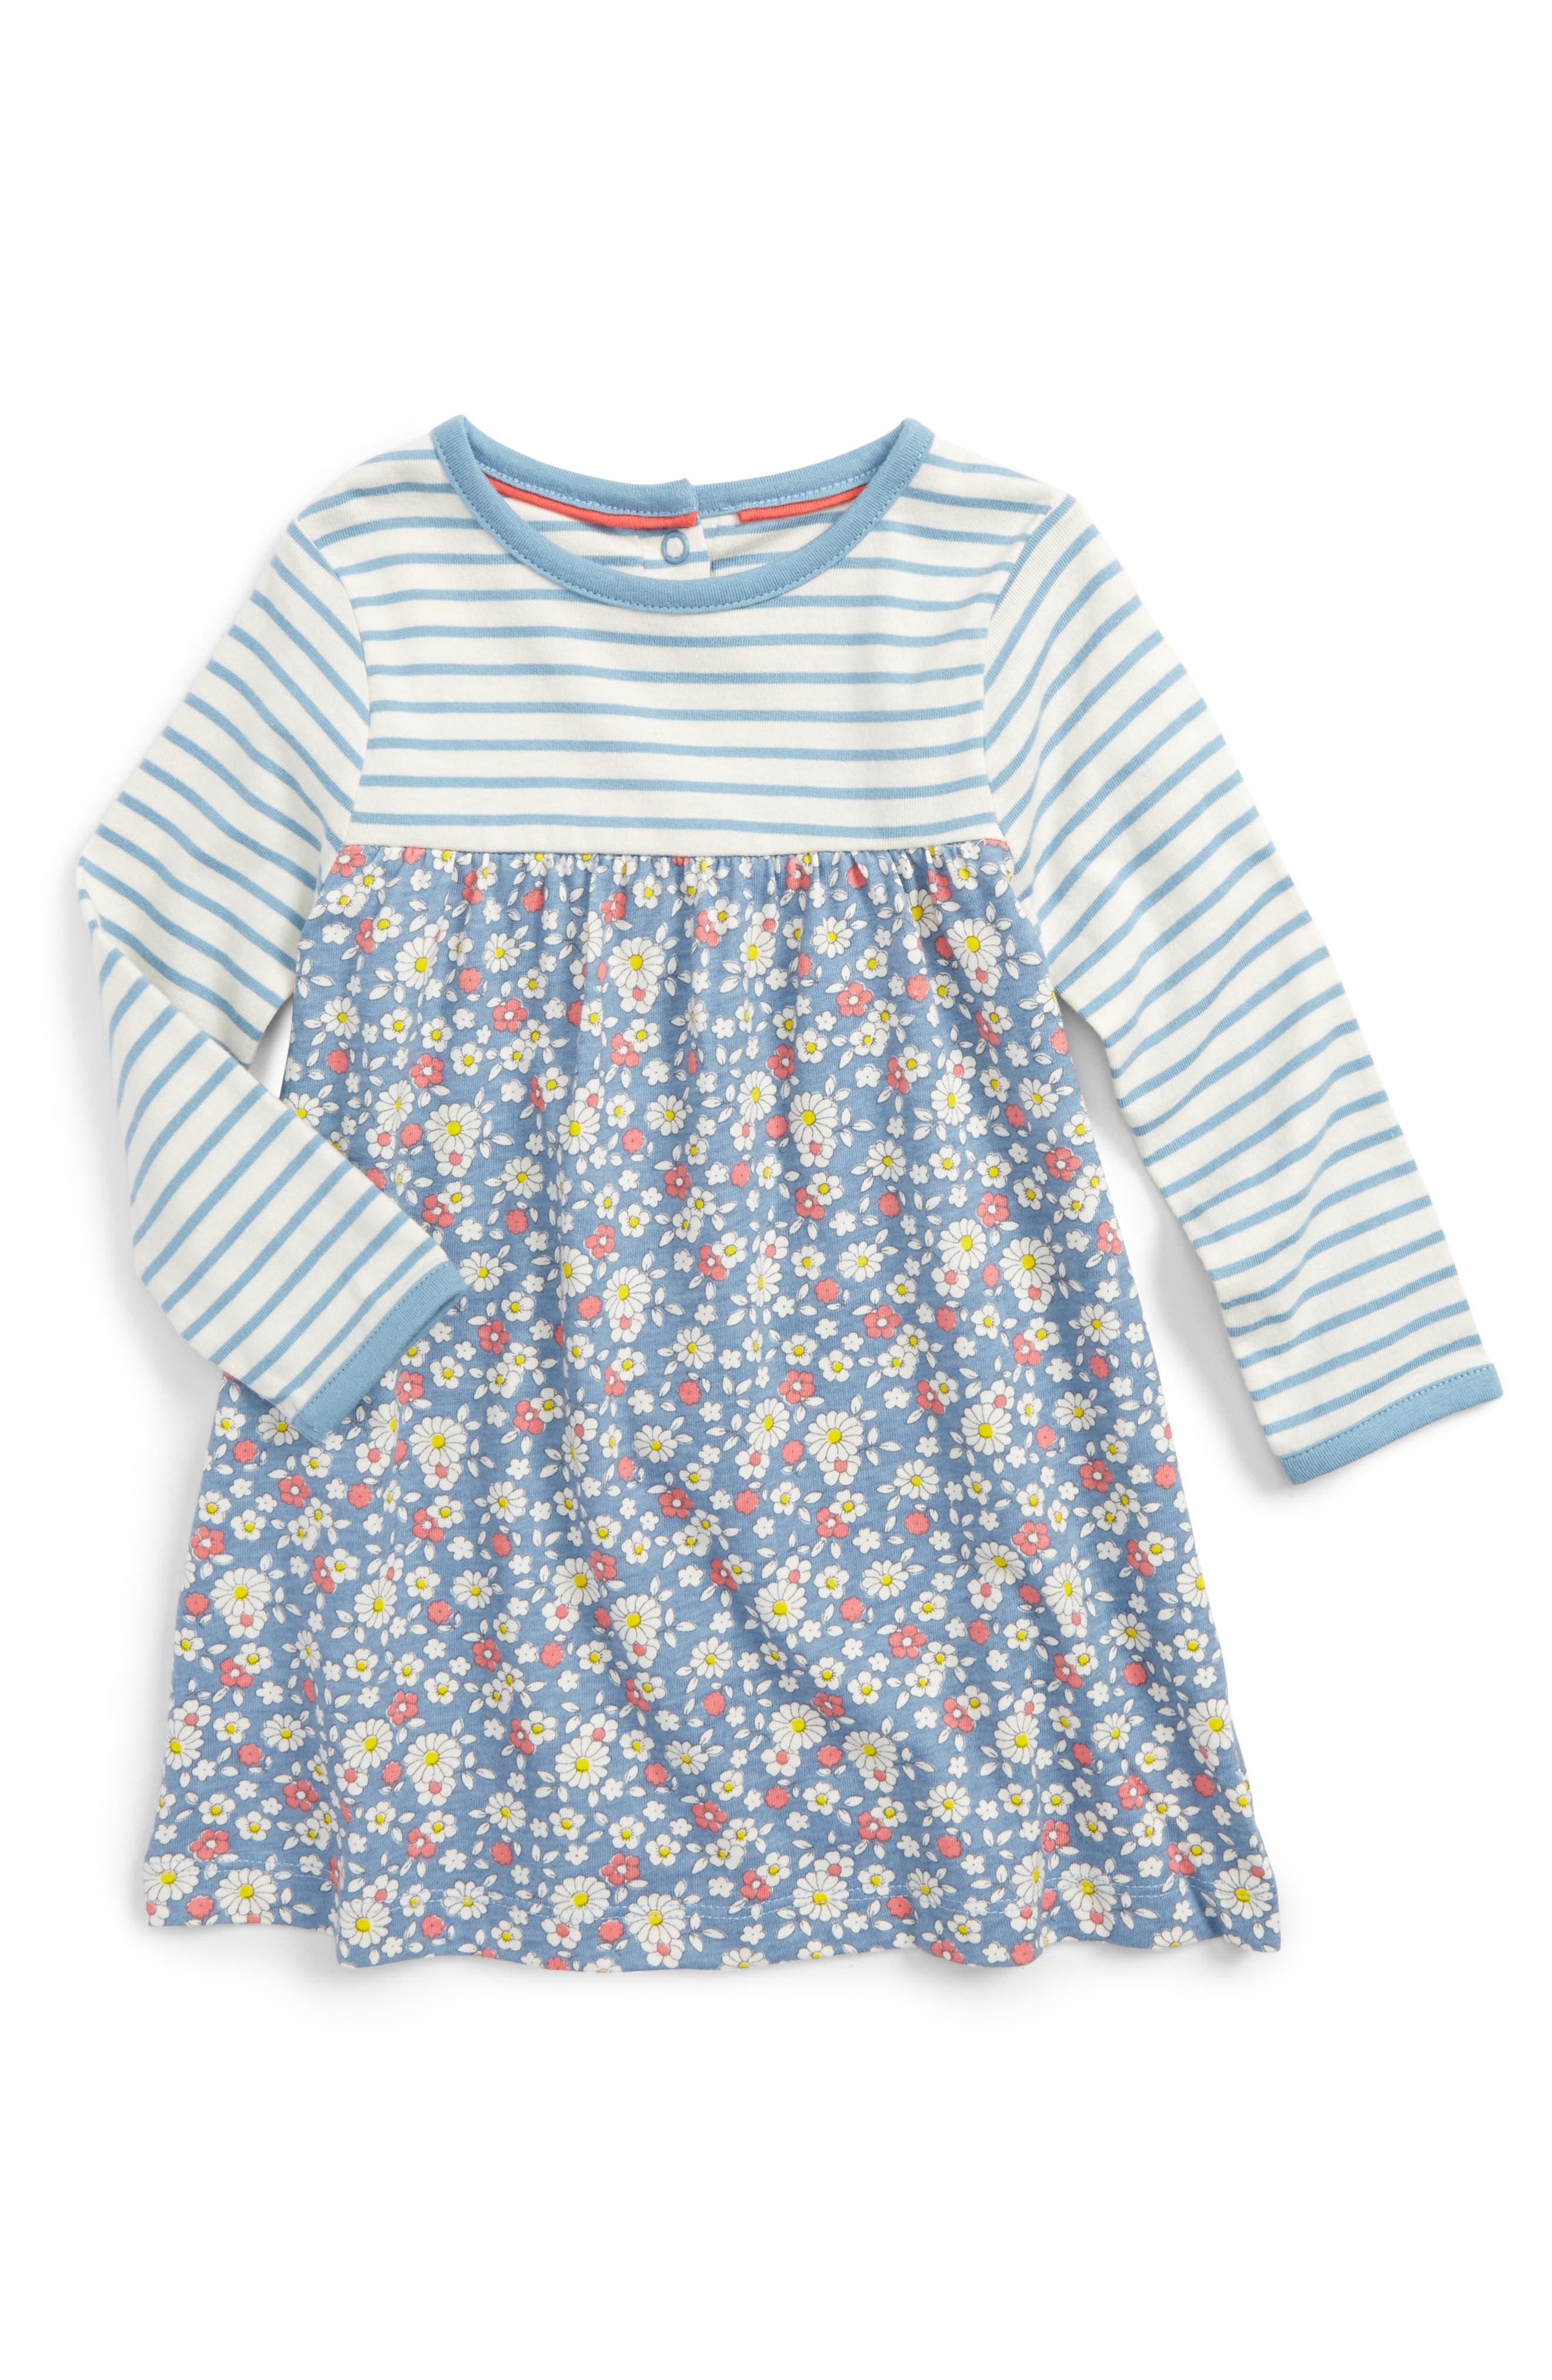 Hotchpotch Dress,                             Main thumbnail 1, color,